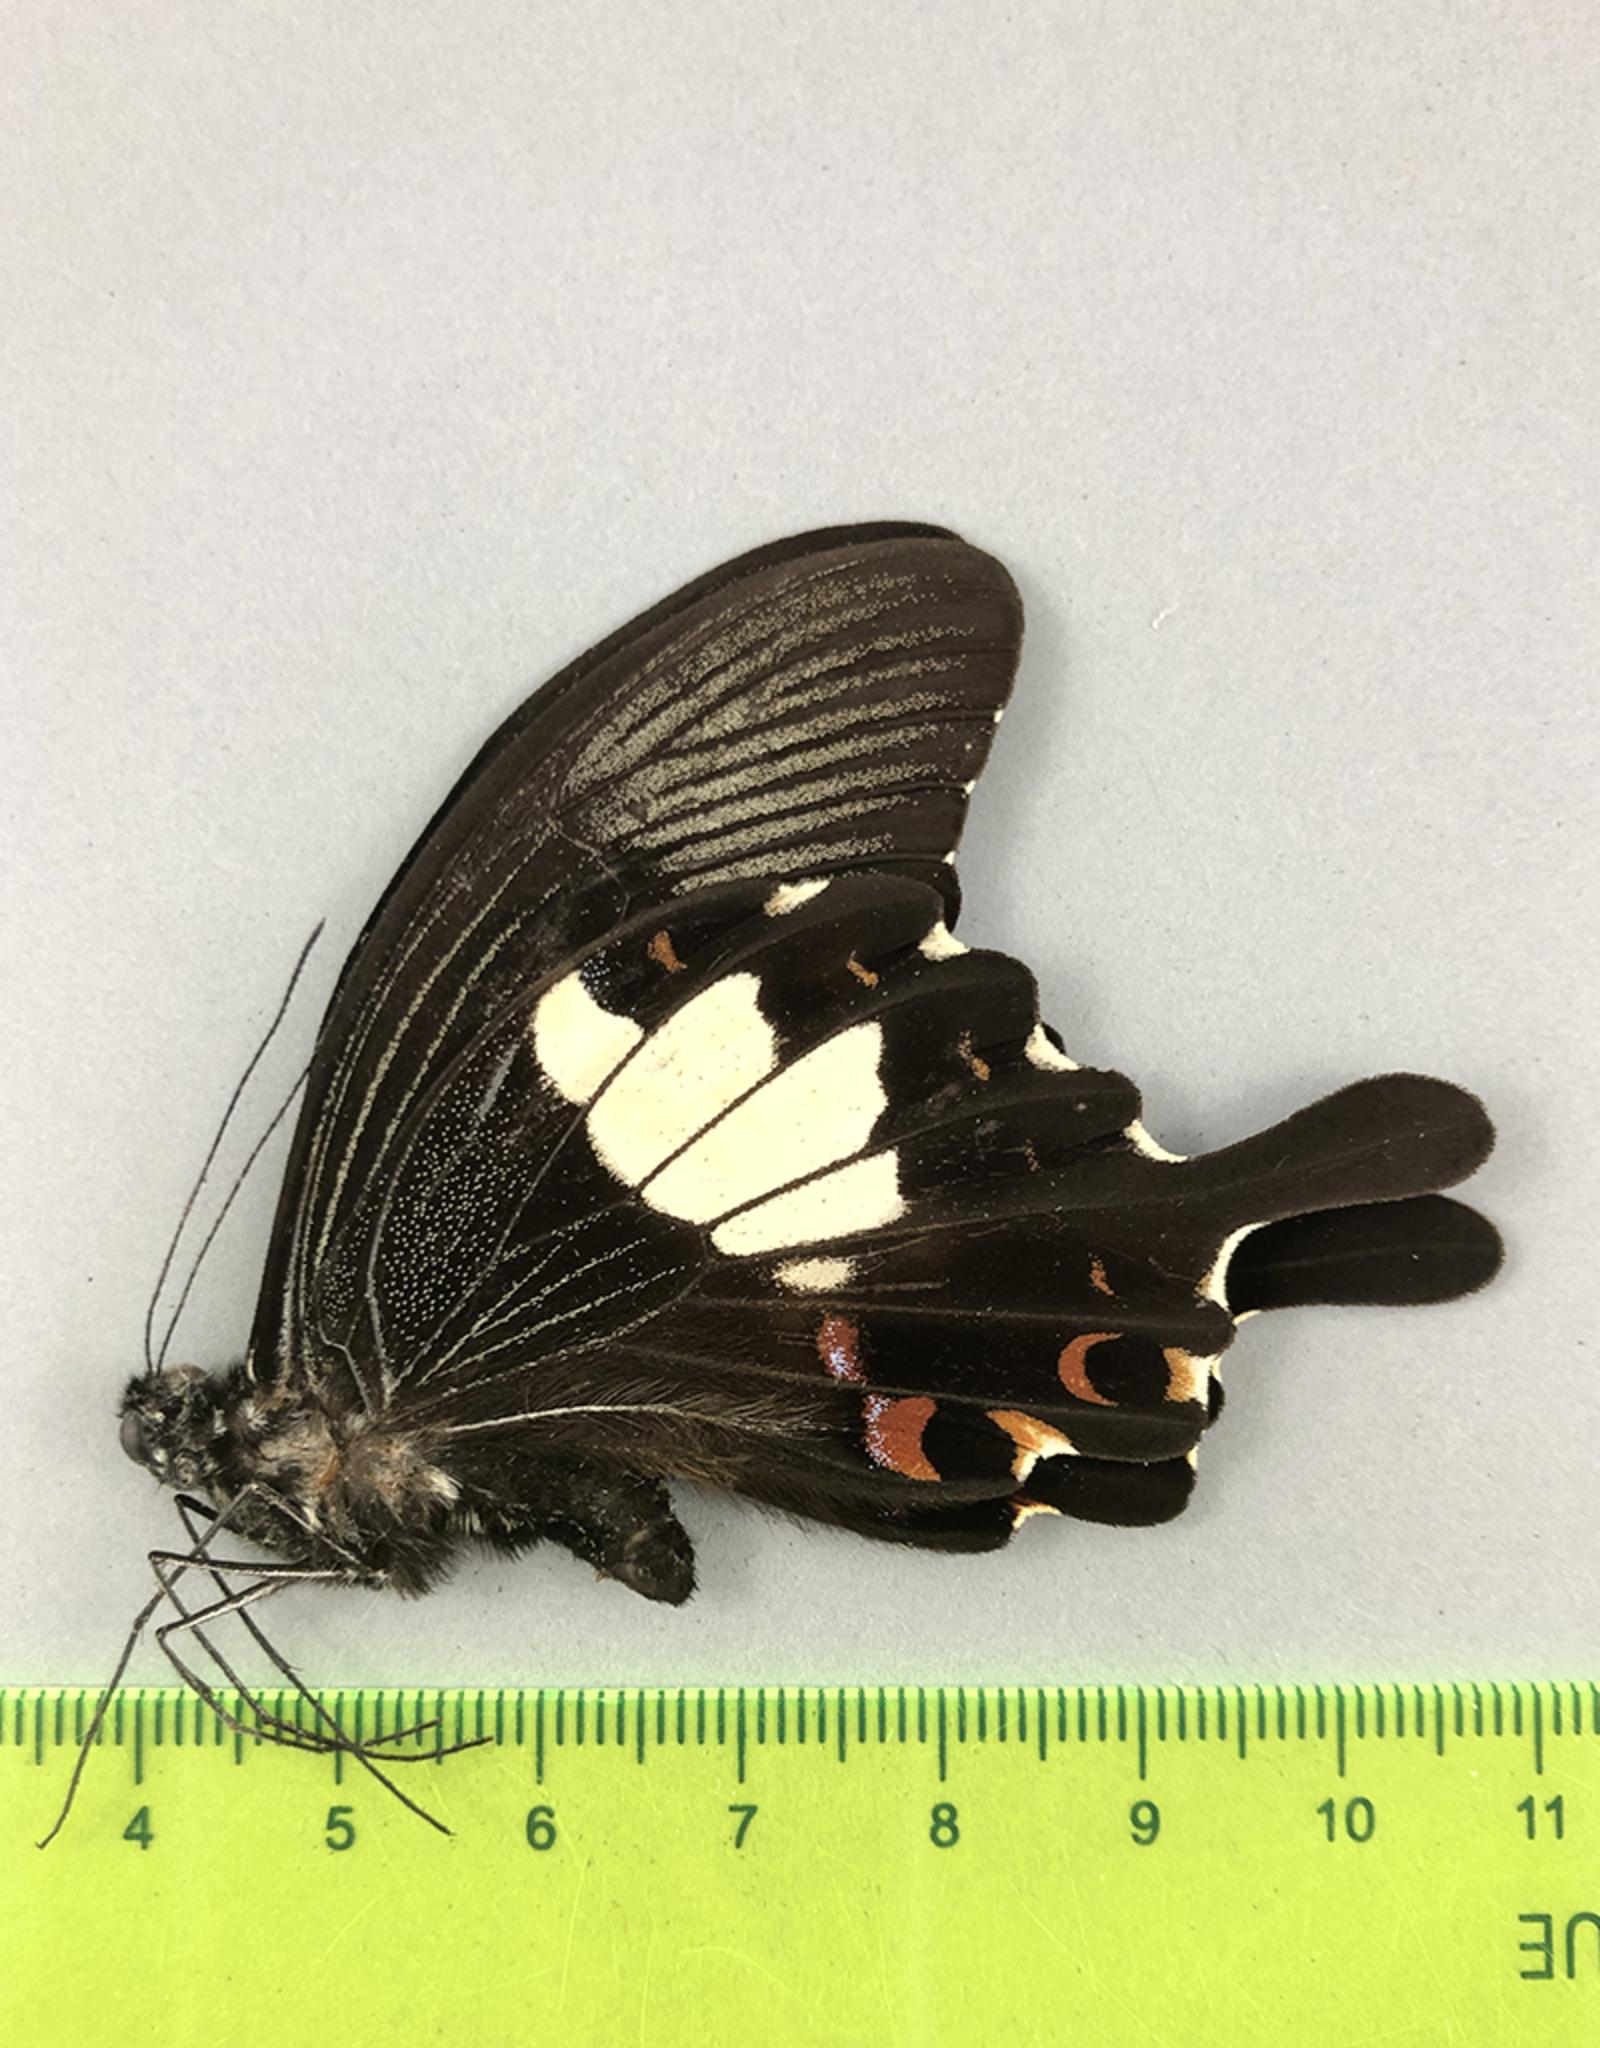 Papilio helenus hystaspes M A1 Mindanao, Philippines